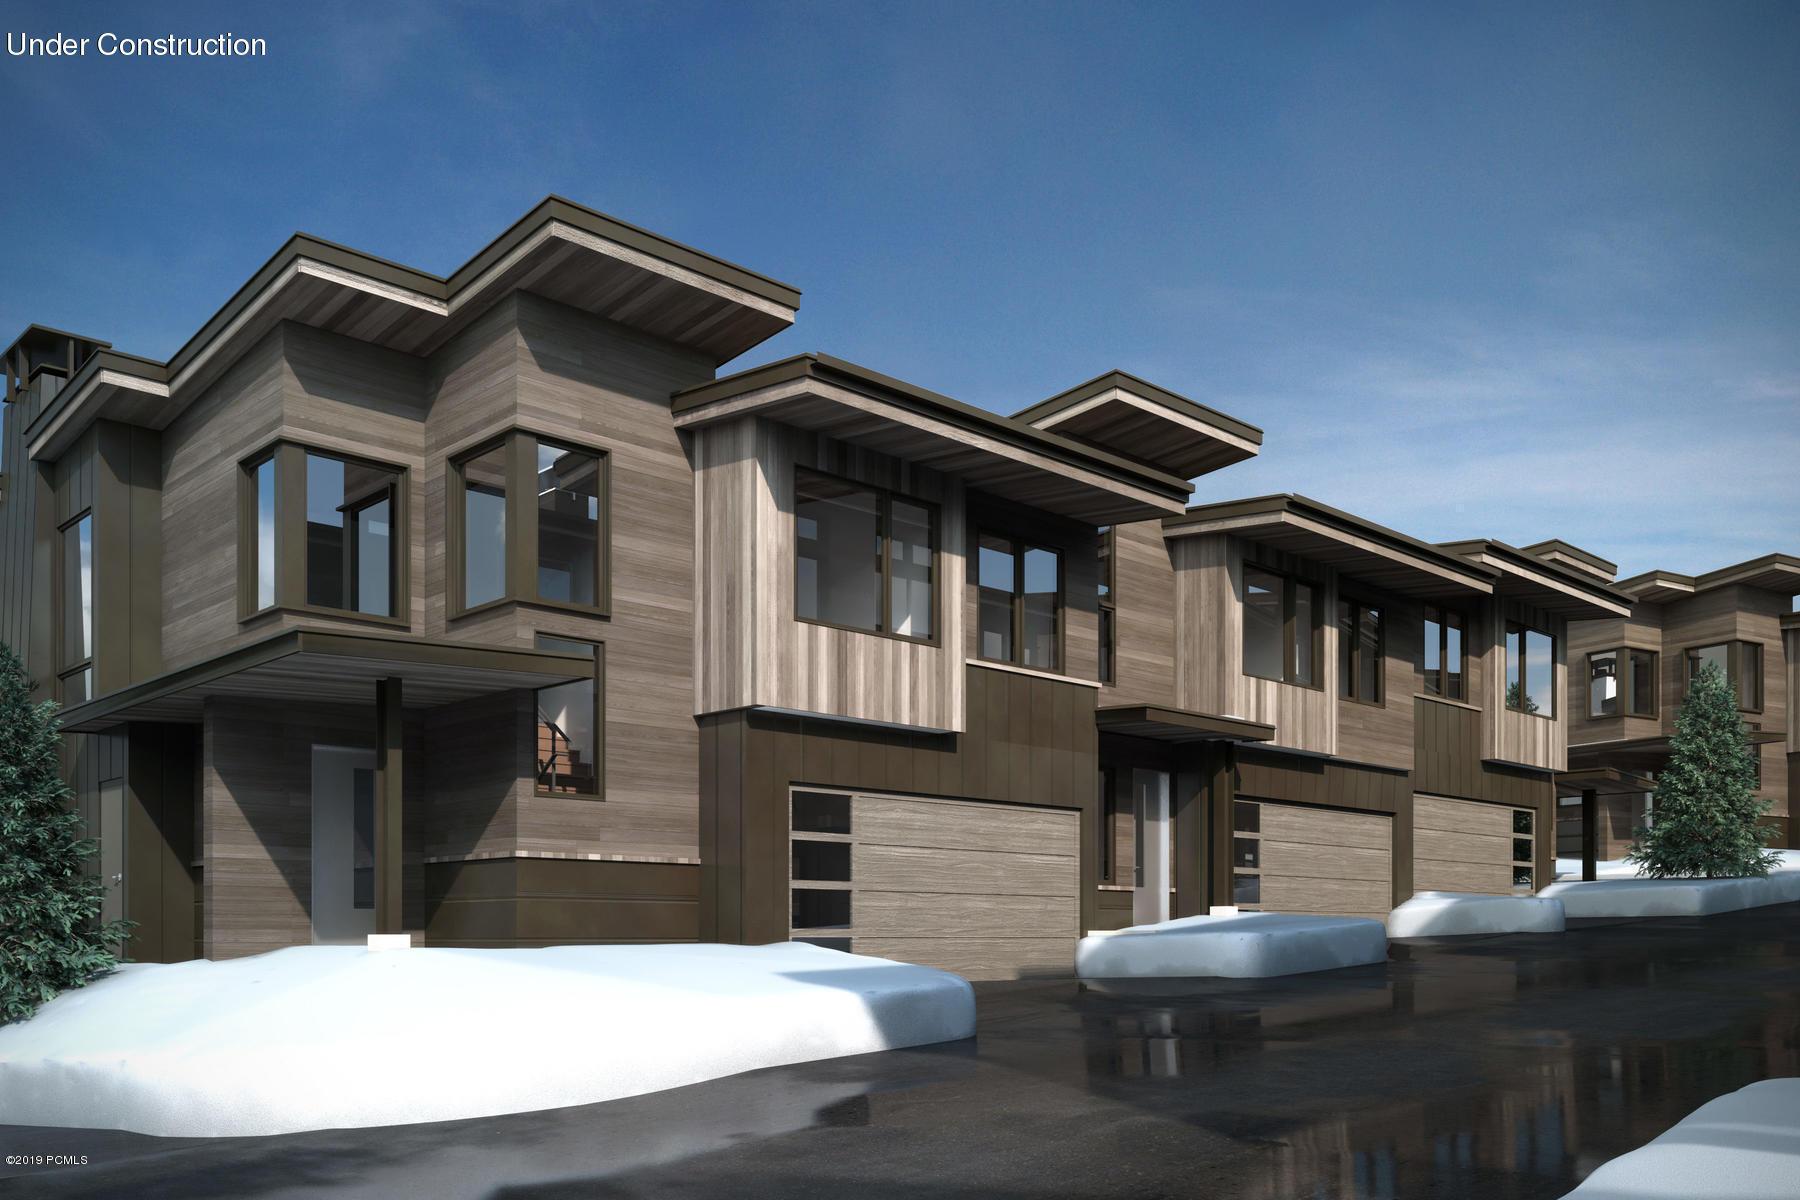 3590 Ridgeline Drive, Park City, Utah 84098, 5 Bedrooms Bedrooms, ,6 BathroomsBathrooms,Condominium,For Sale,Ridgeline,20190109112430415765000000